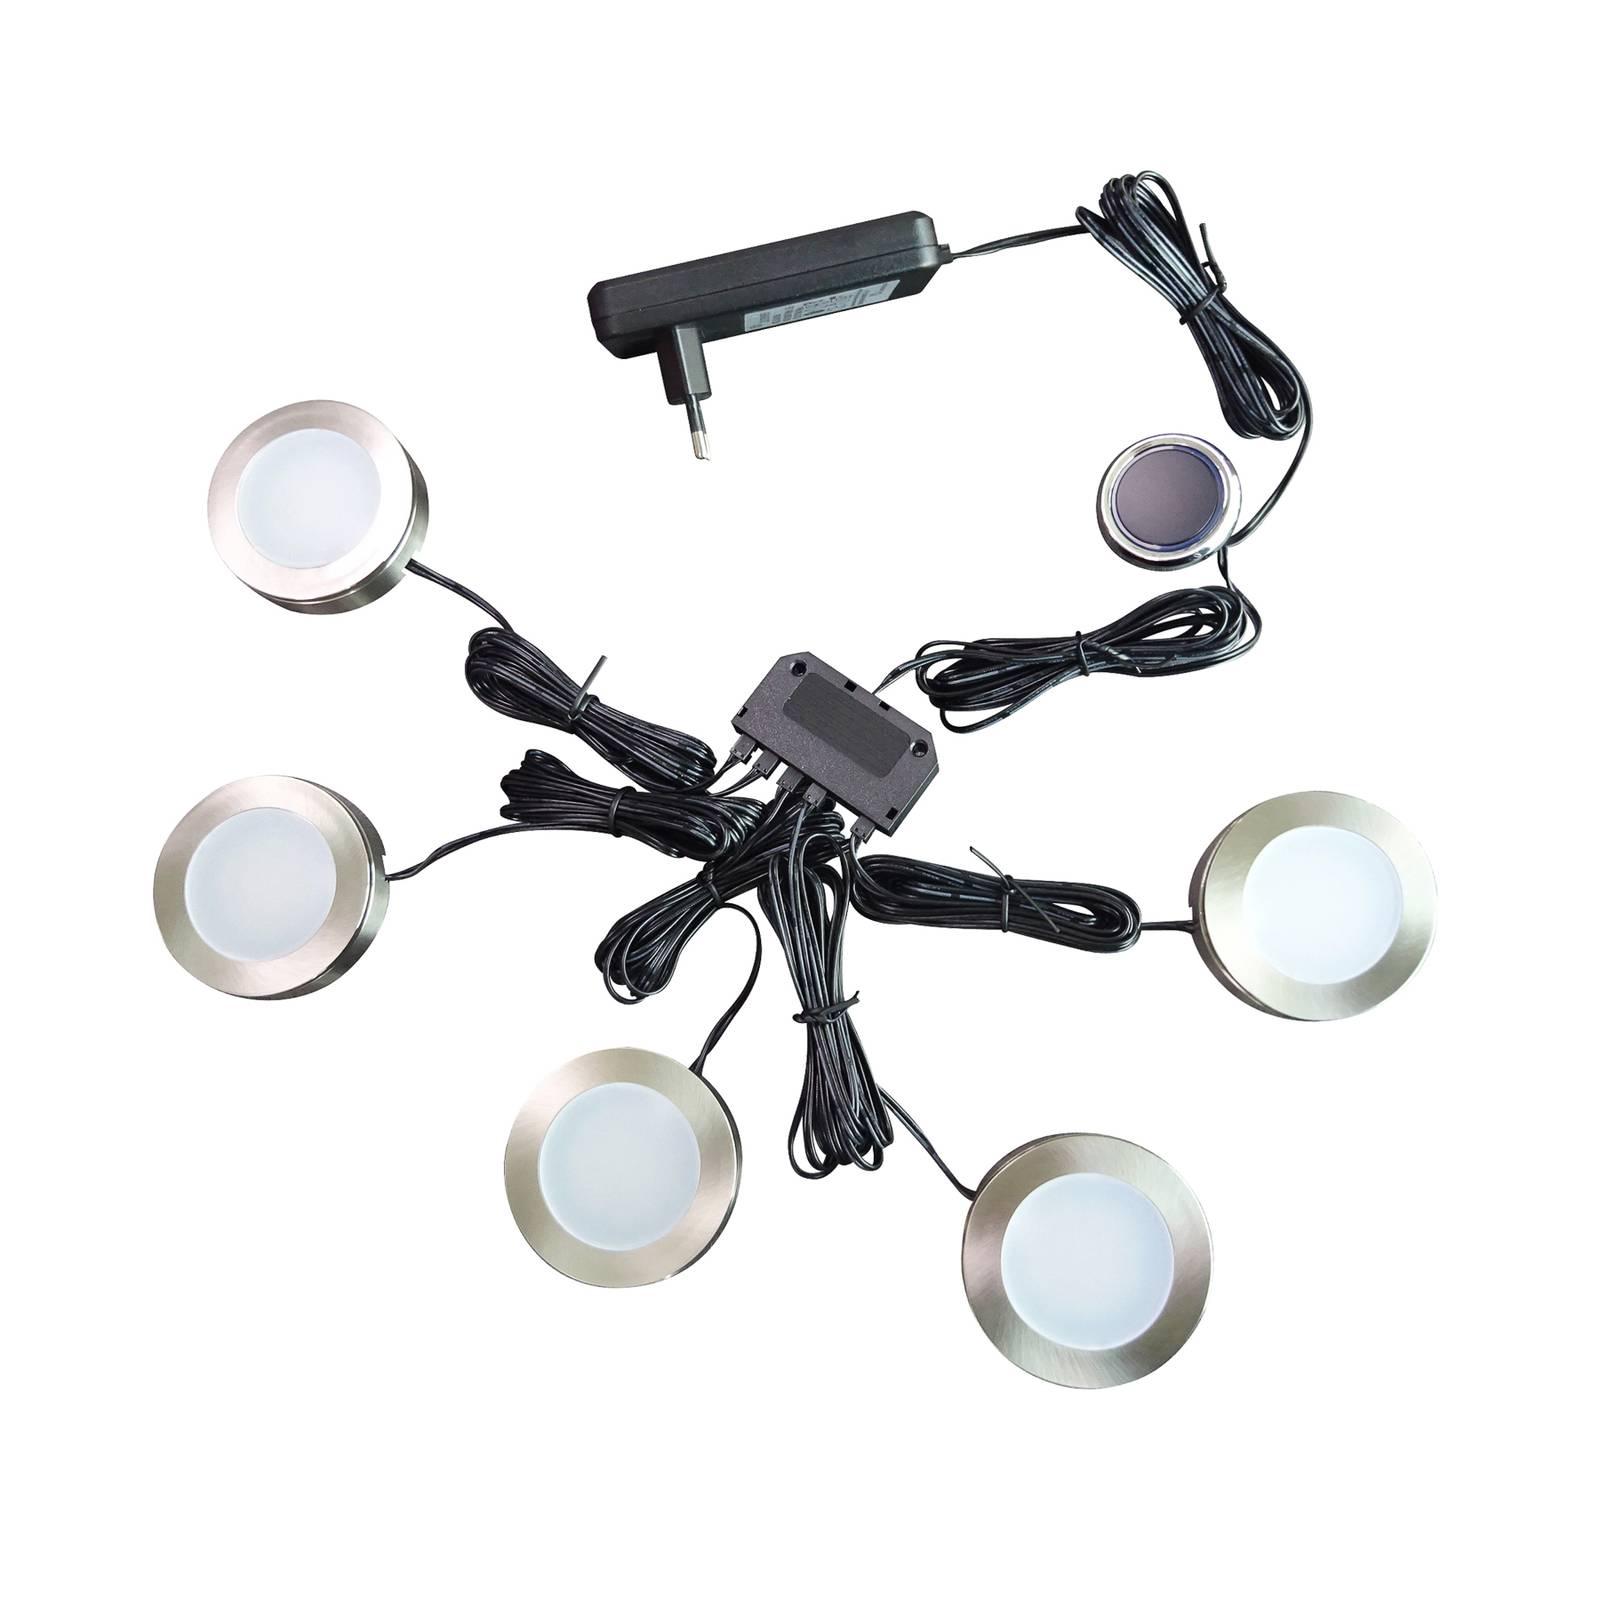 Arcchio Vilam -LED-kaapinalusvalaisin, 5 kpl